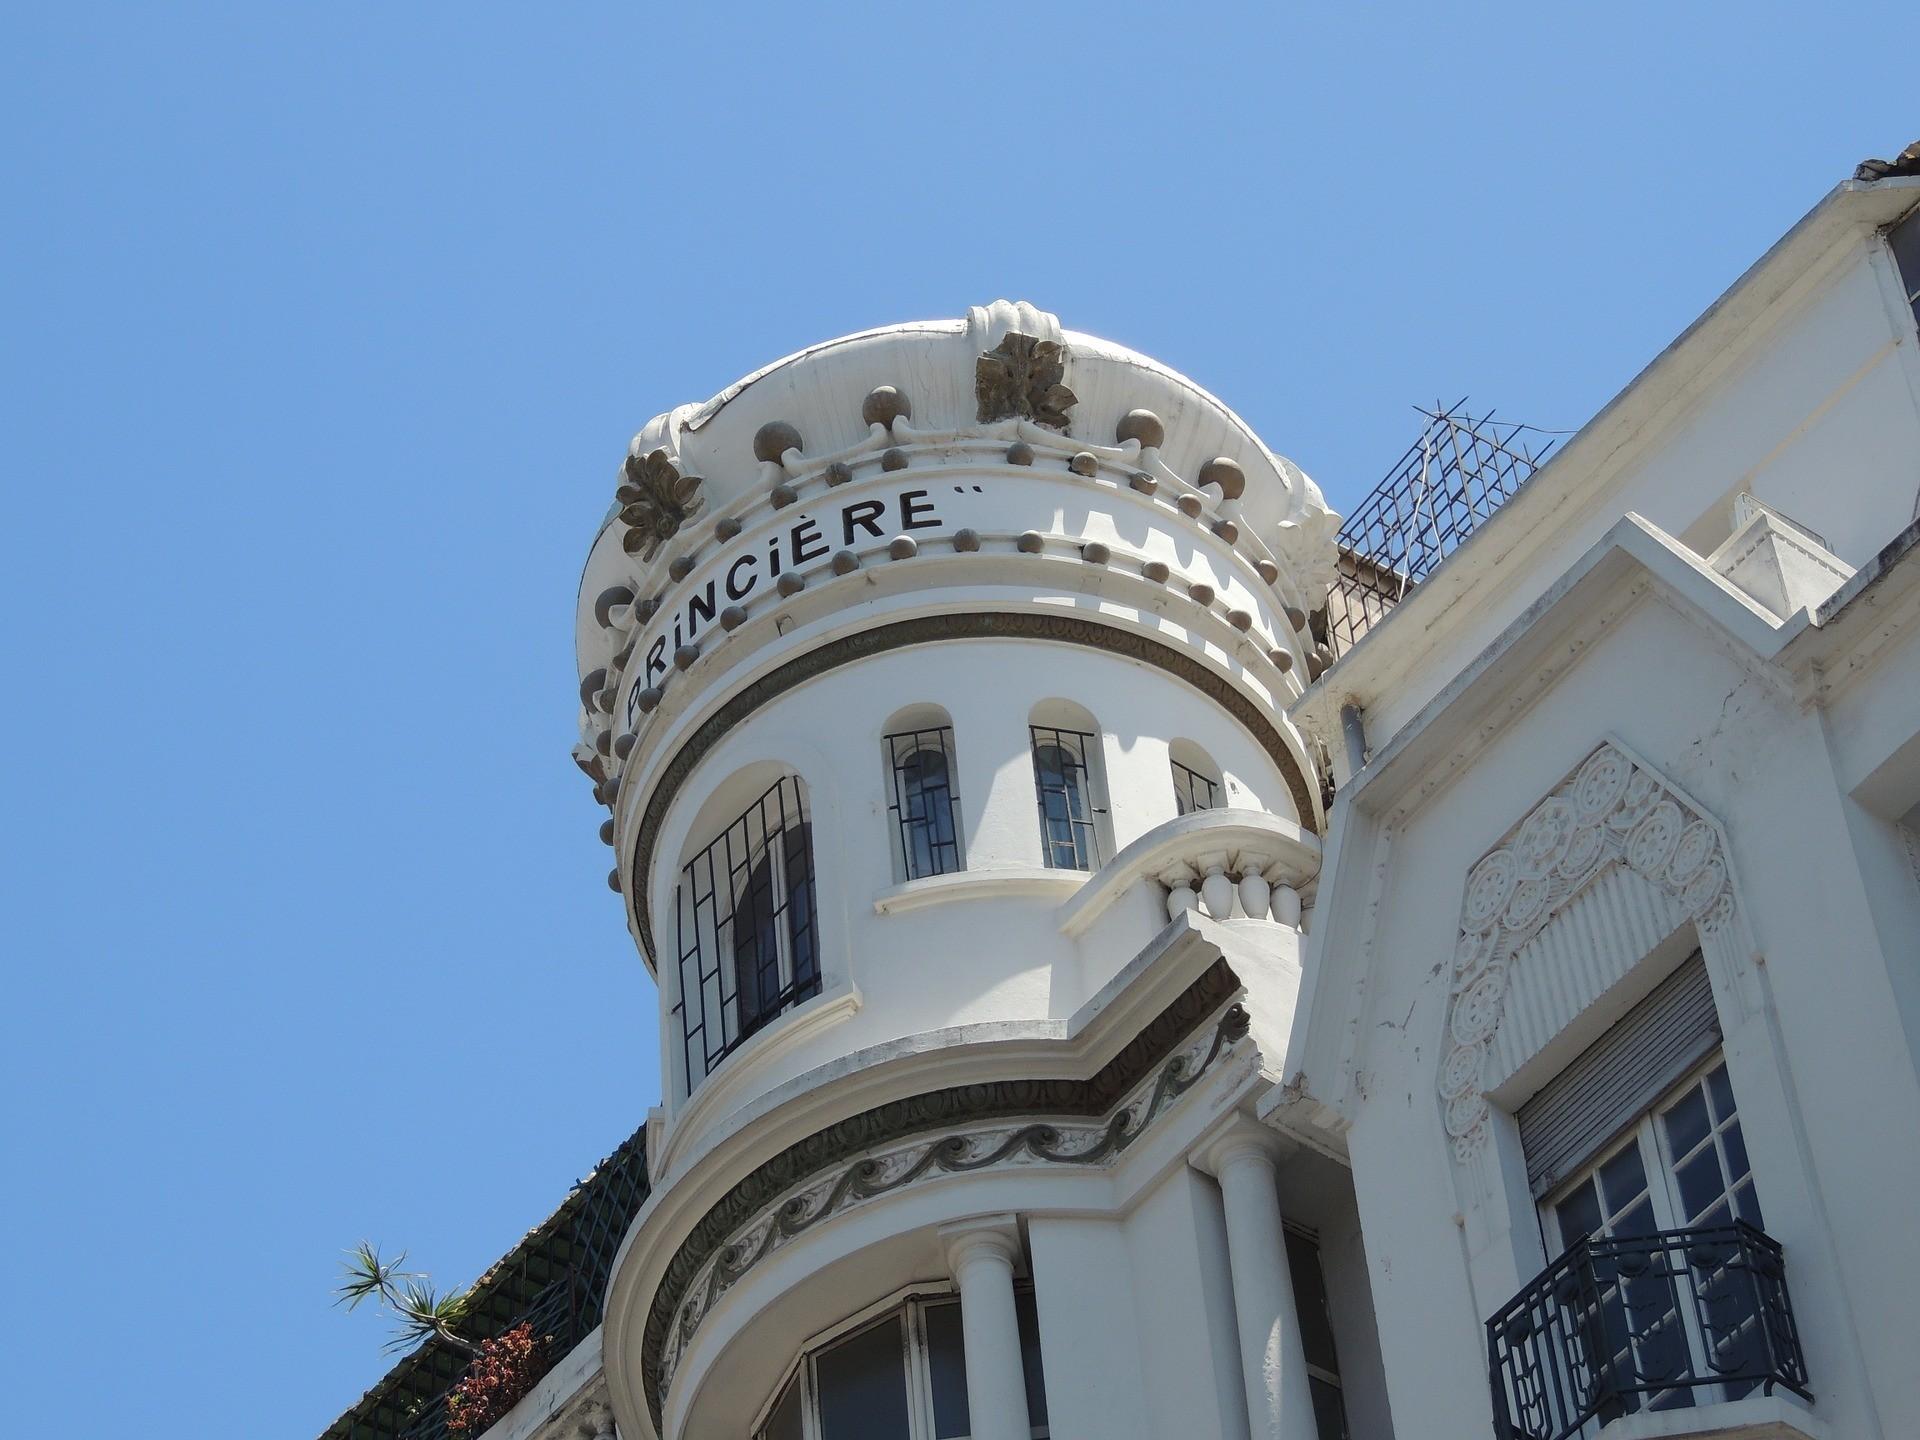 Art Deco buildings in Casablanca Photo Stratageme2015 on Pixabay